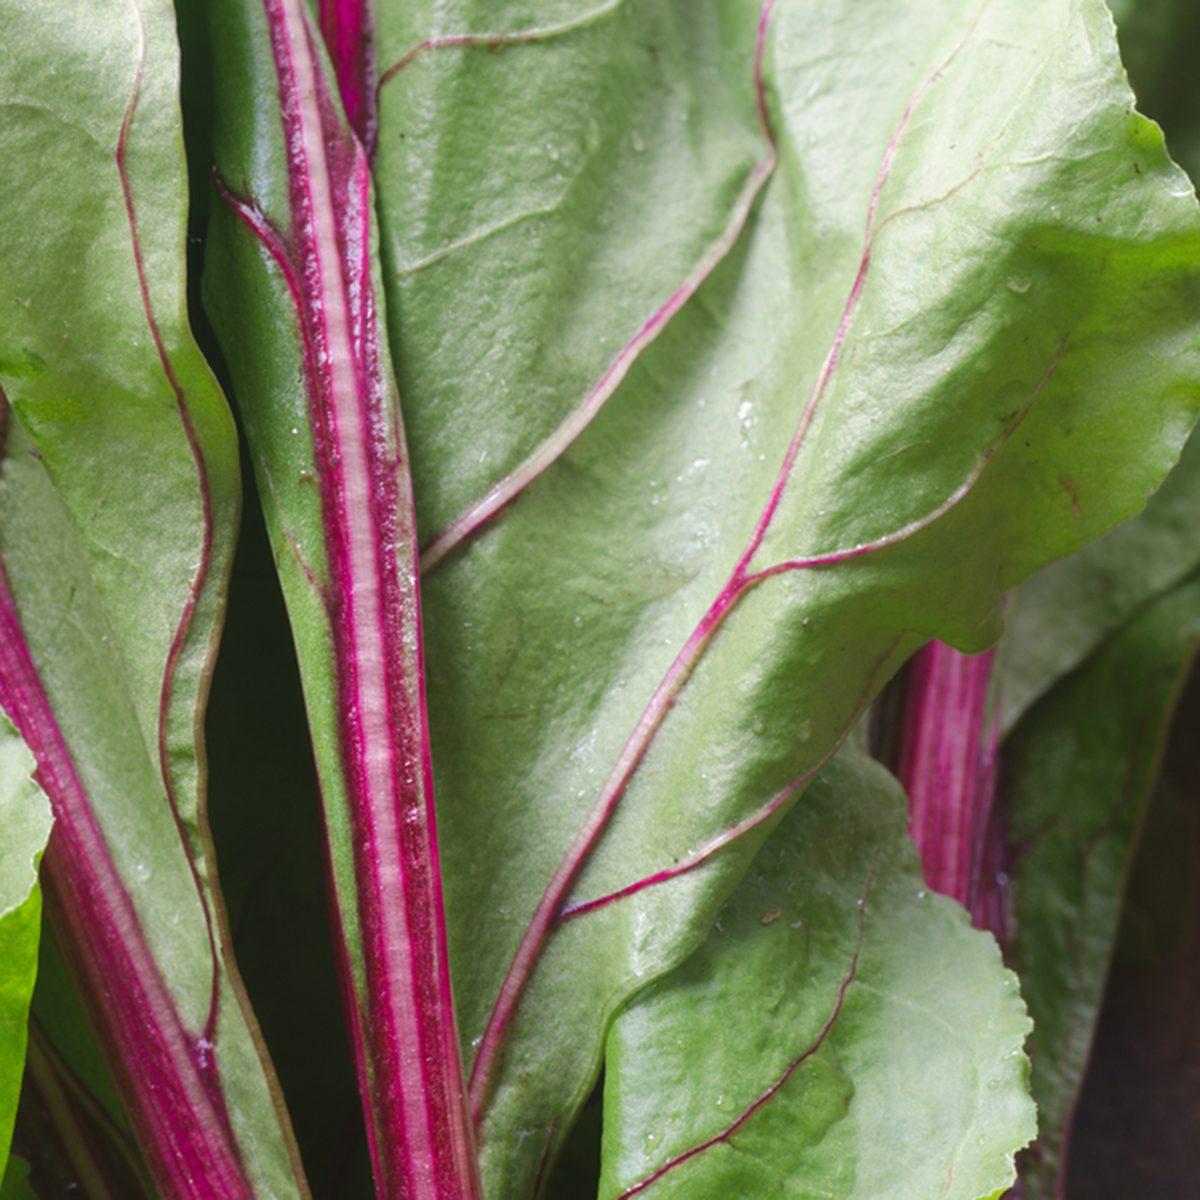 closeup to fresh beet leaves